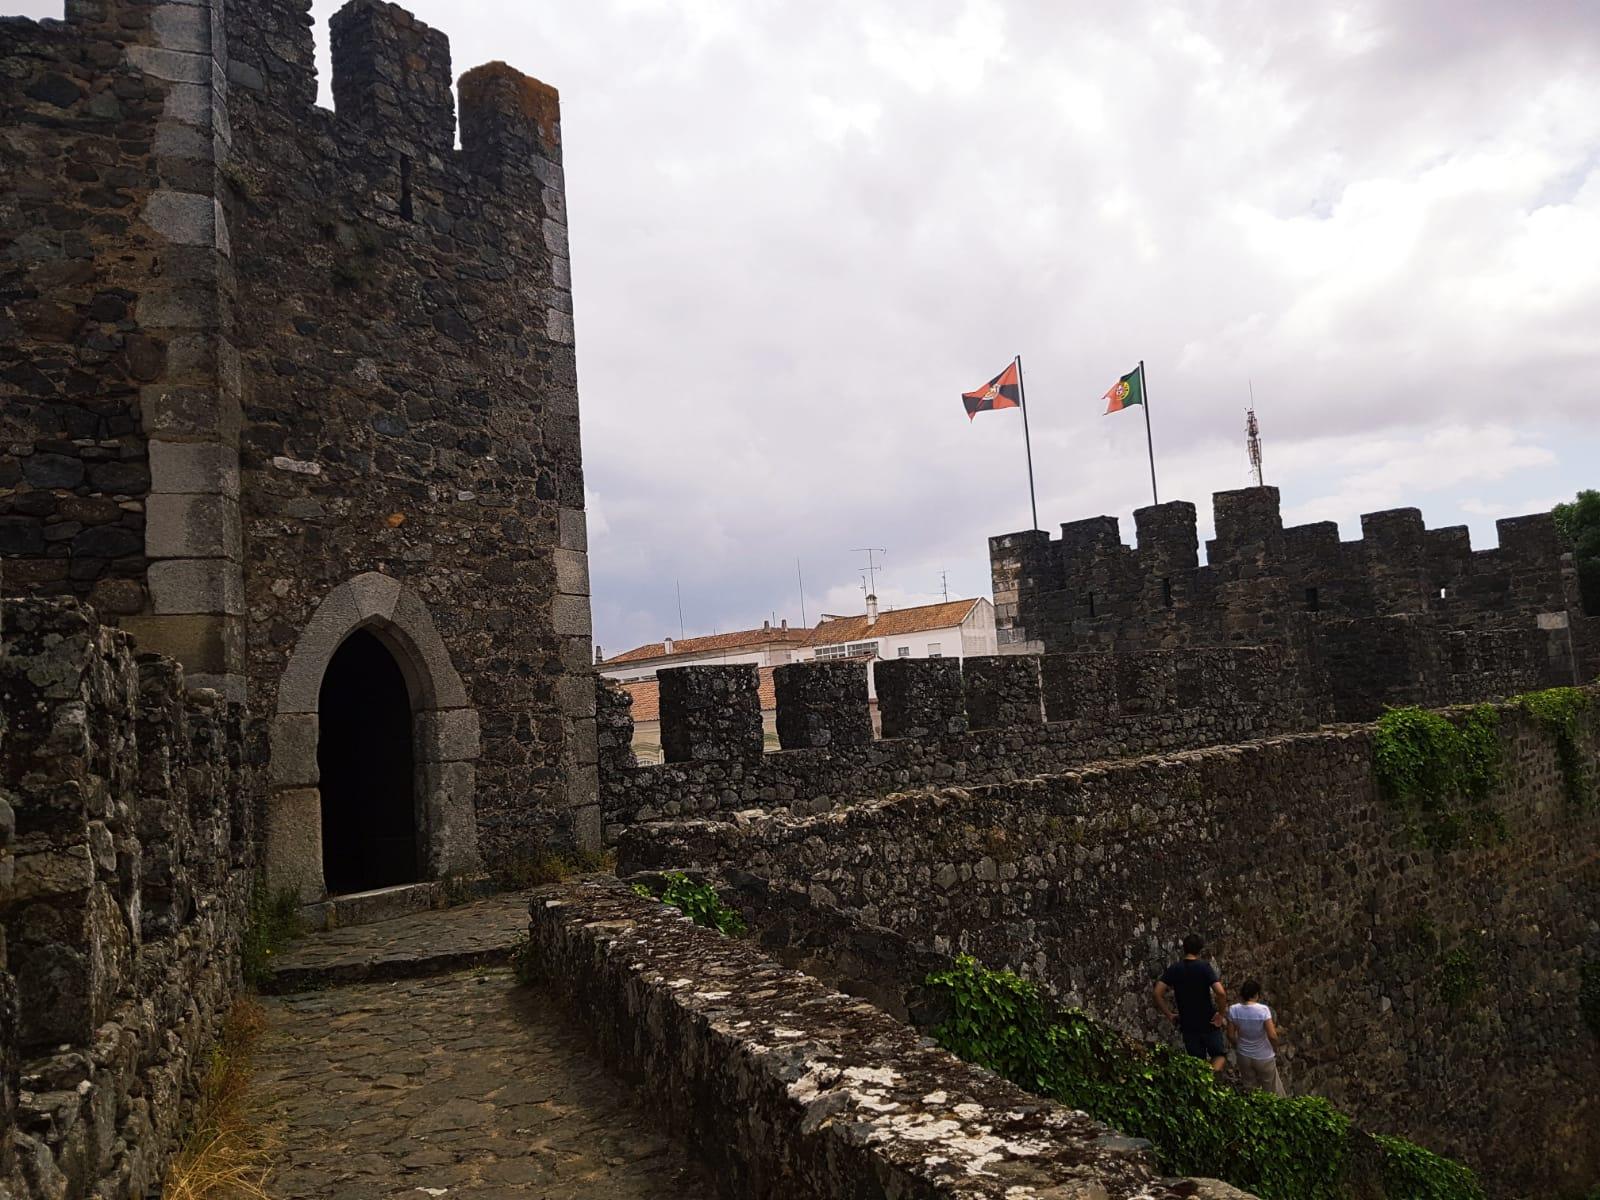 visiter-la-region-alentejo-breja-chateau-tourisme (2)